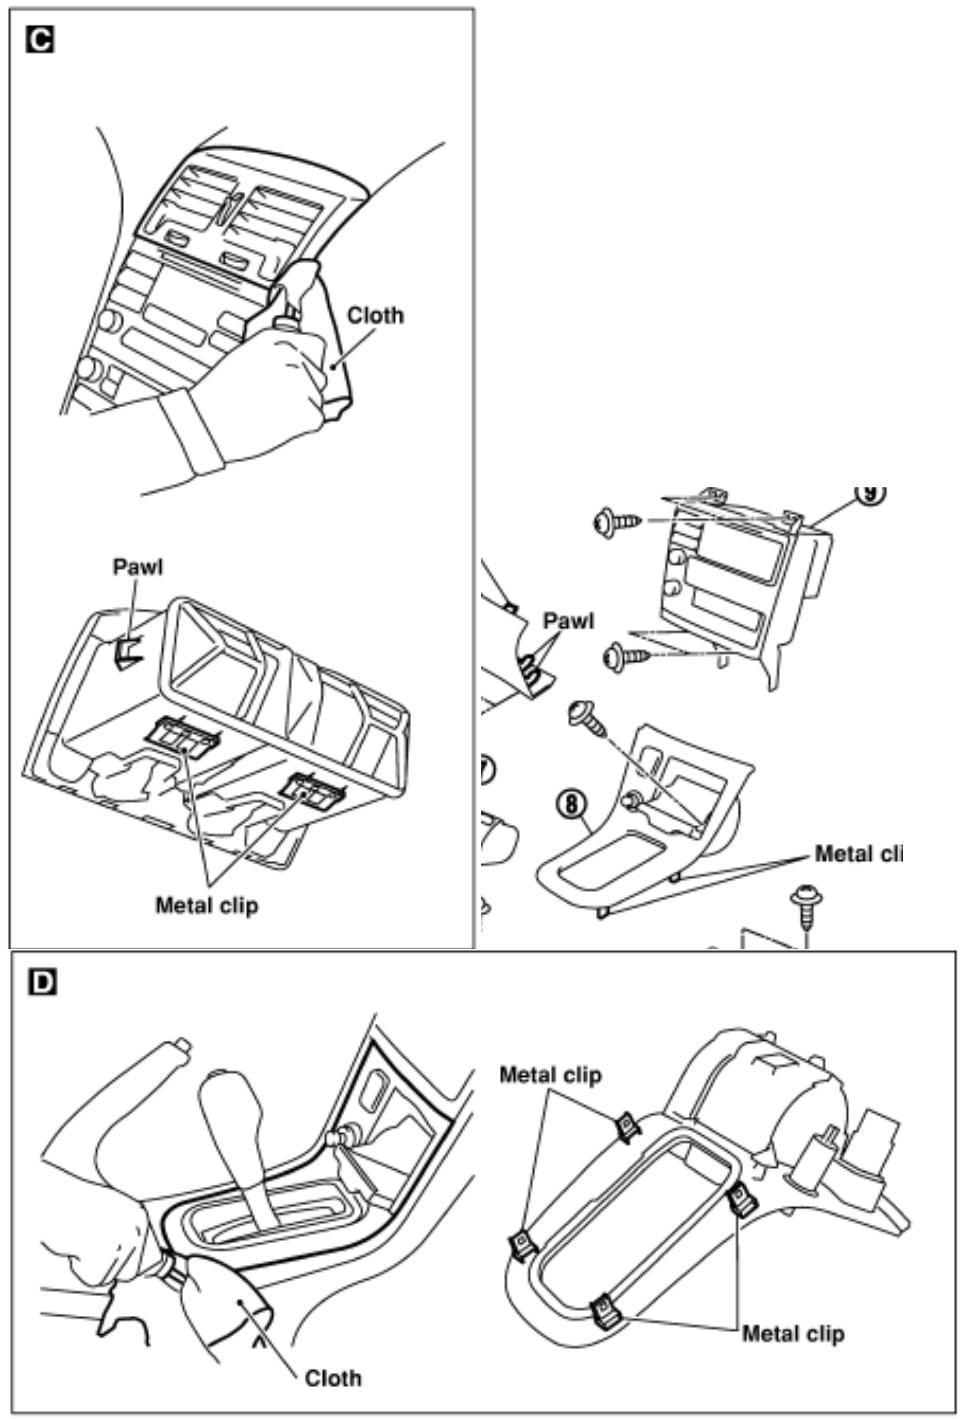 How to Fix Bose Random Speaker Cutout on 5thgen Maxima